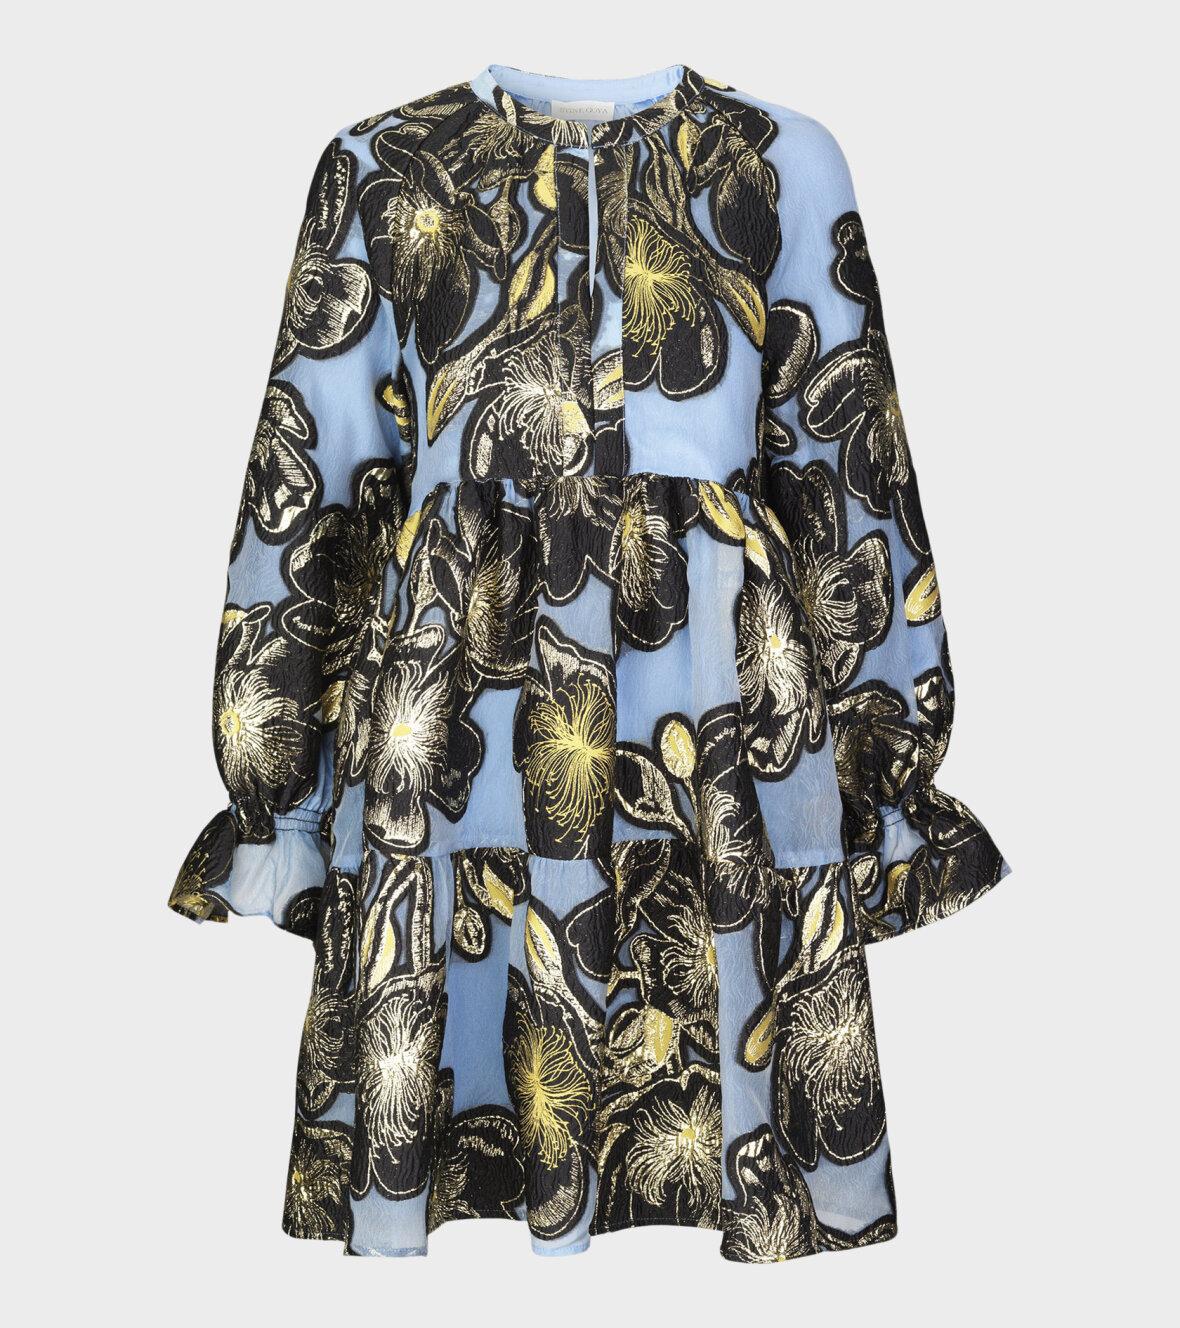 Stine Goya Ivana Organza Kjole i Jasmine Gold